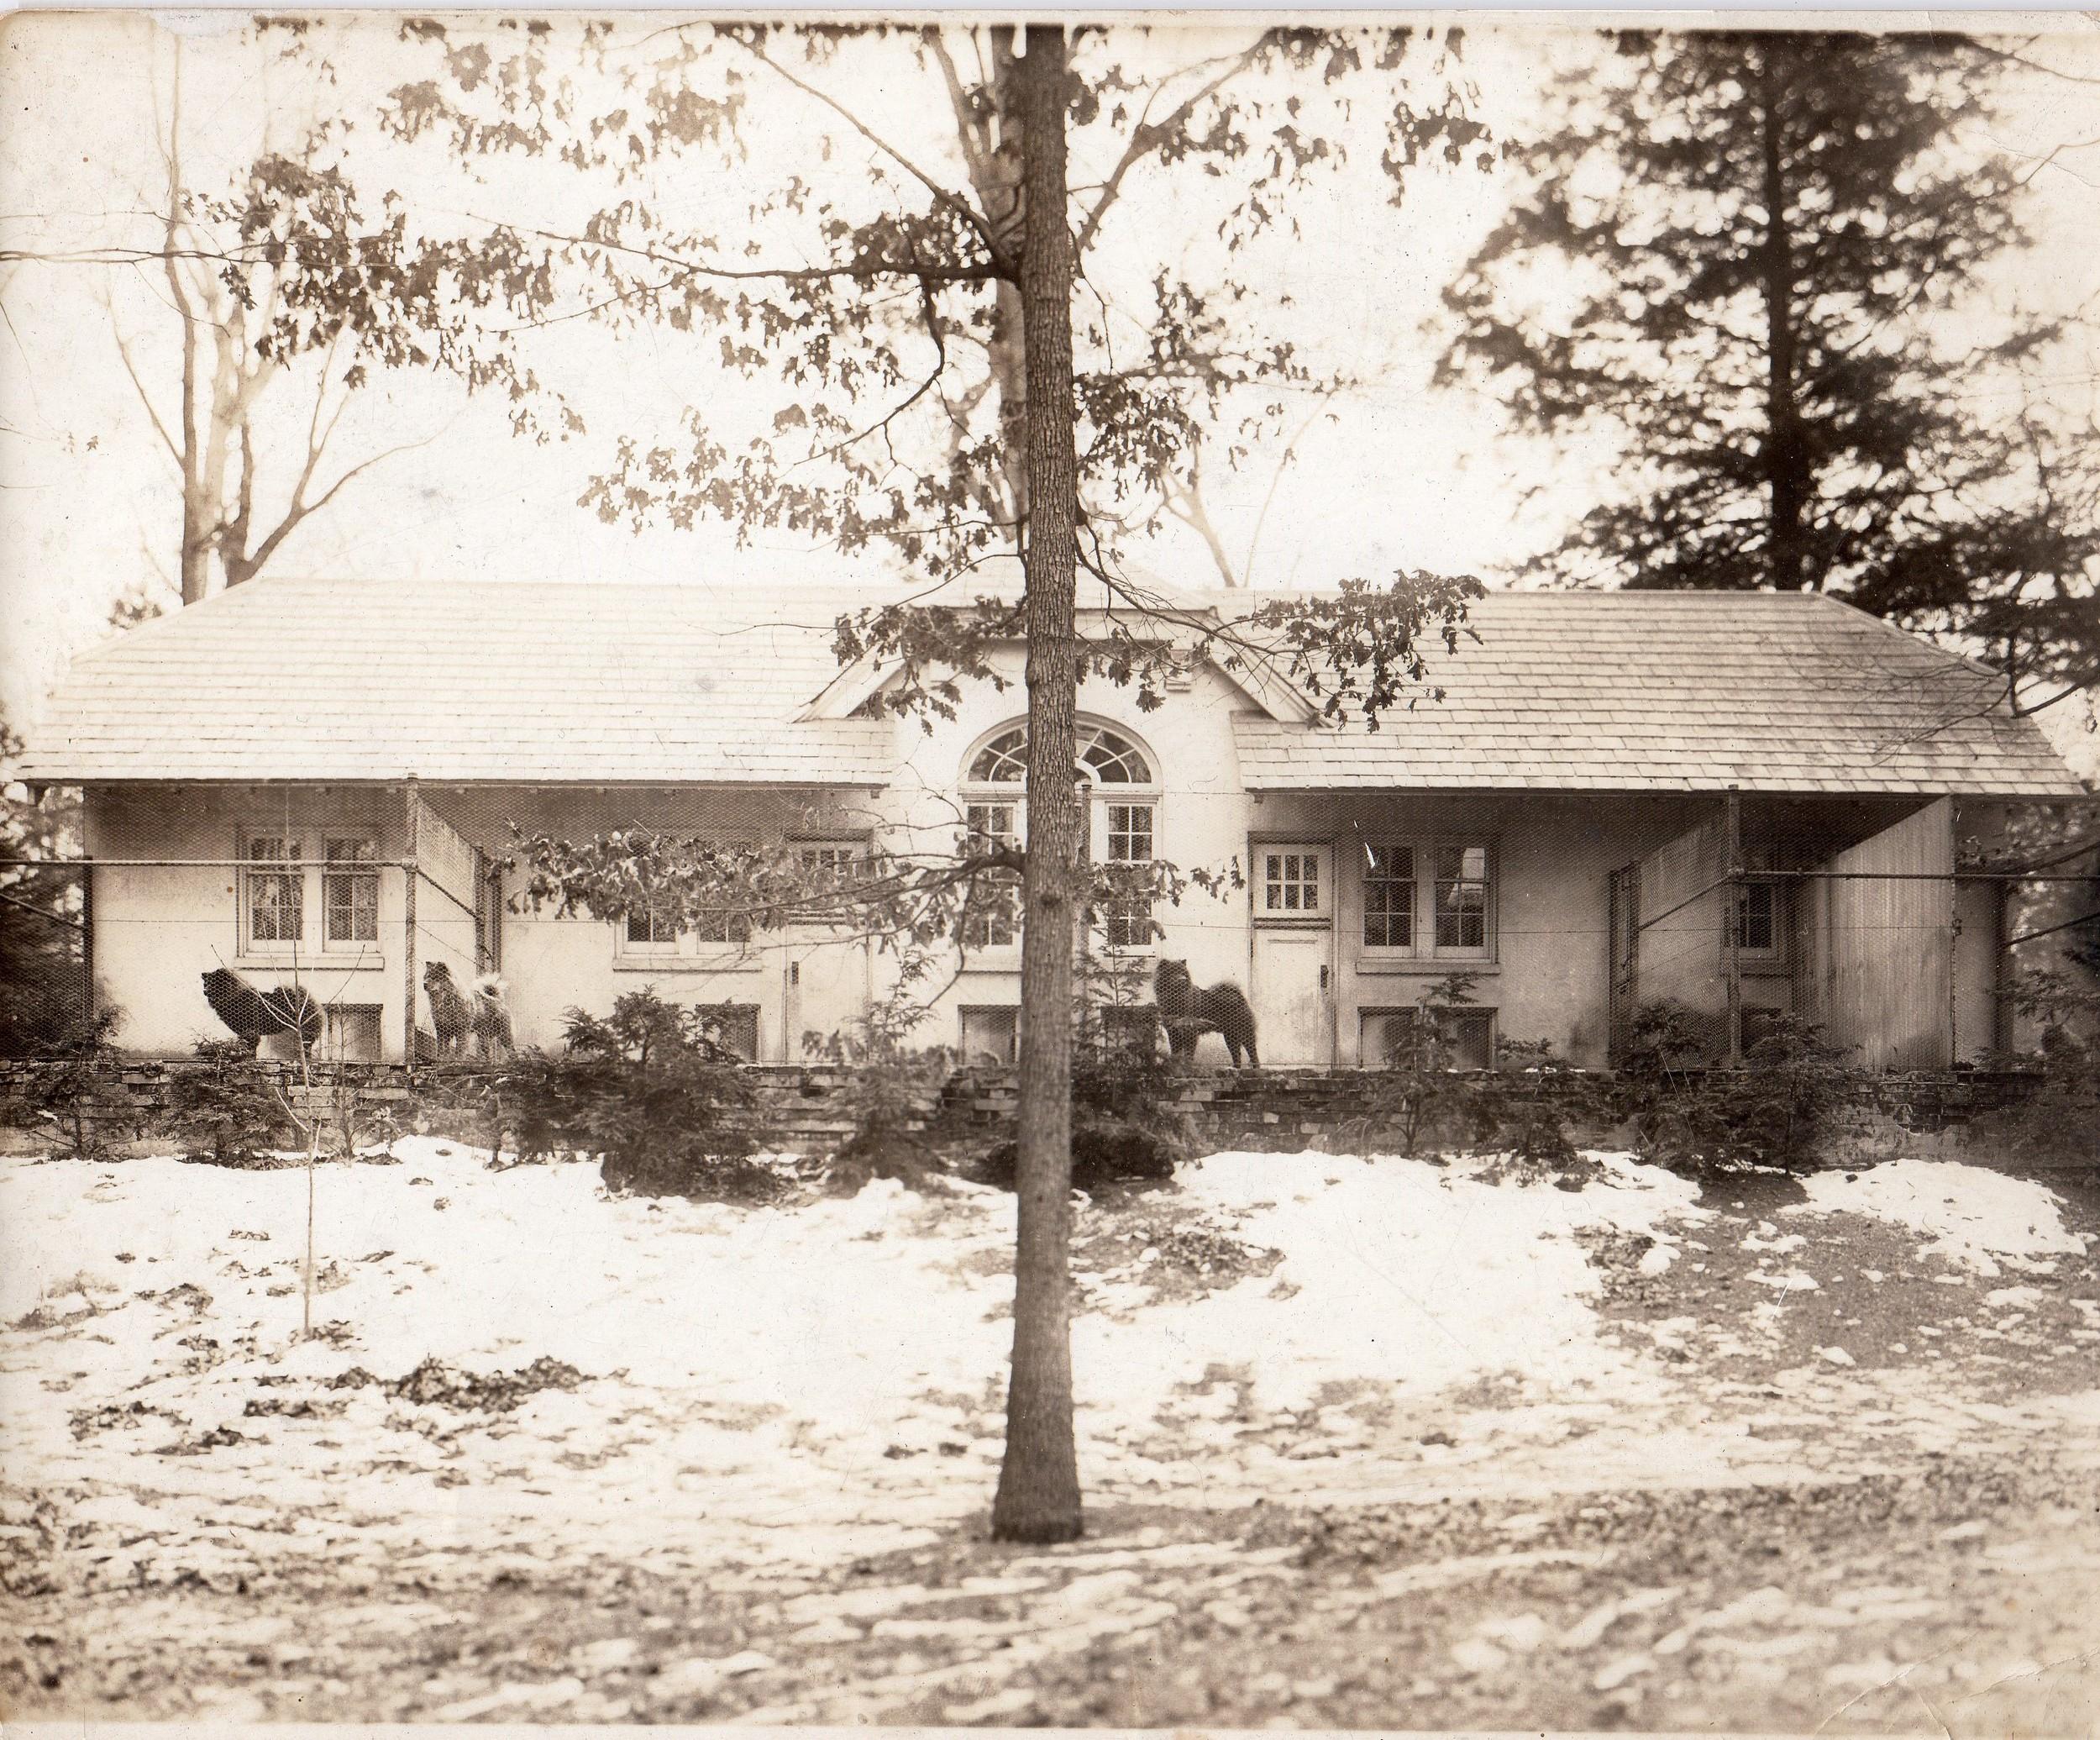 Kennel House 1920's.jpg